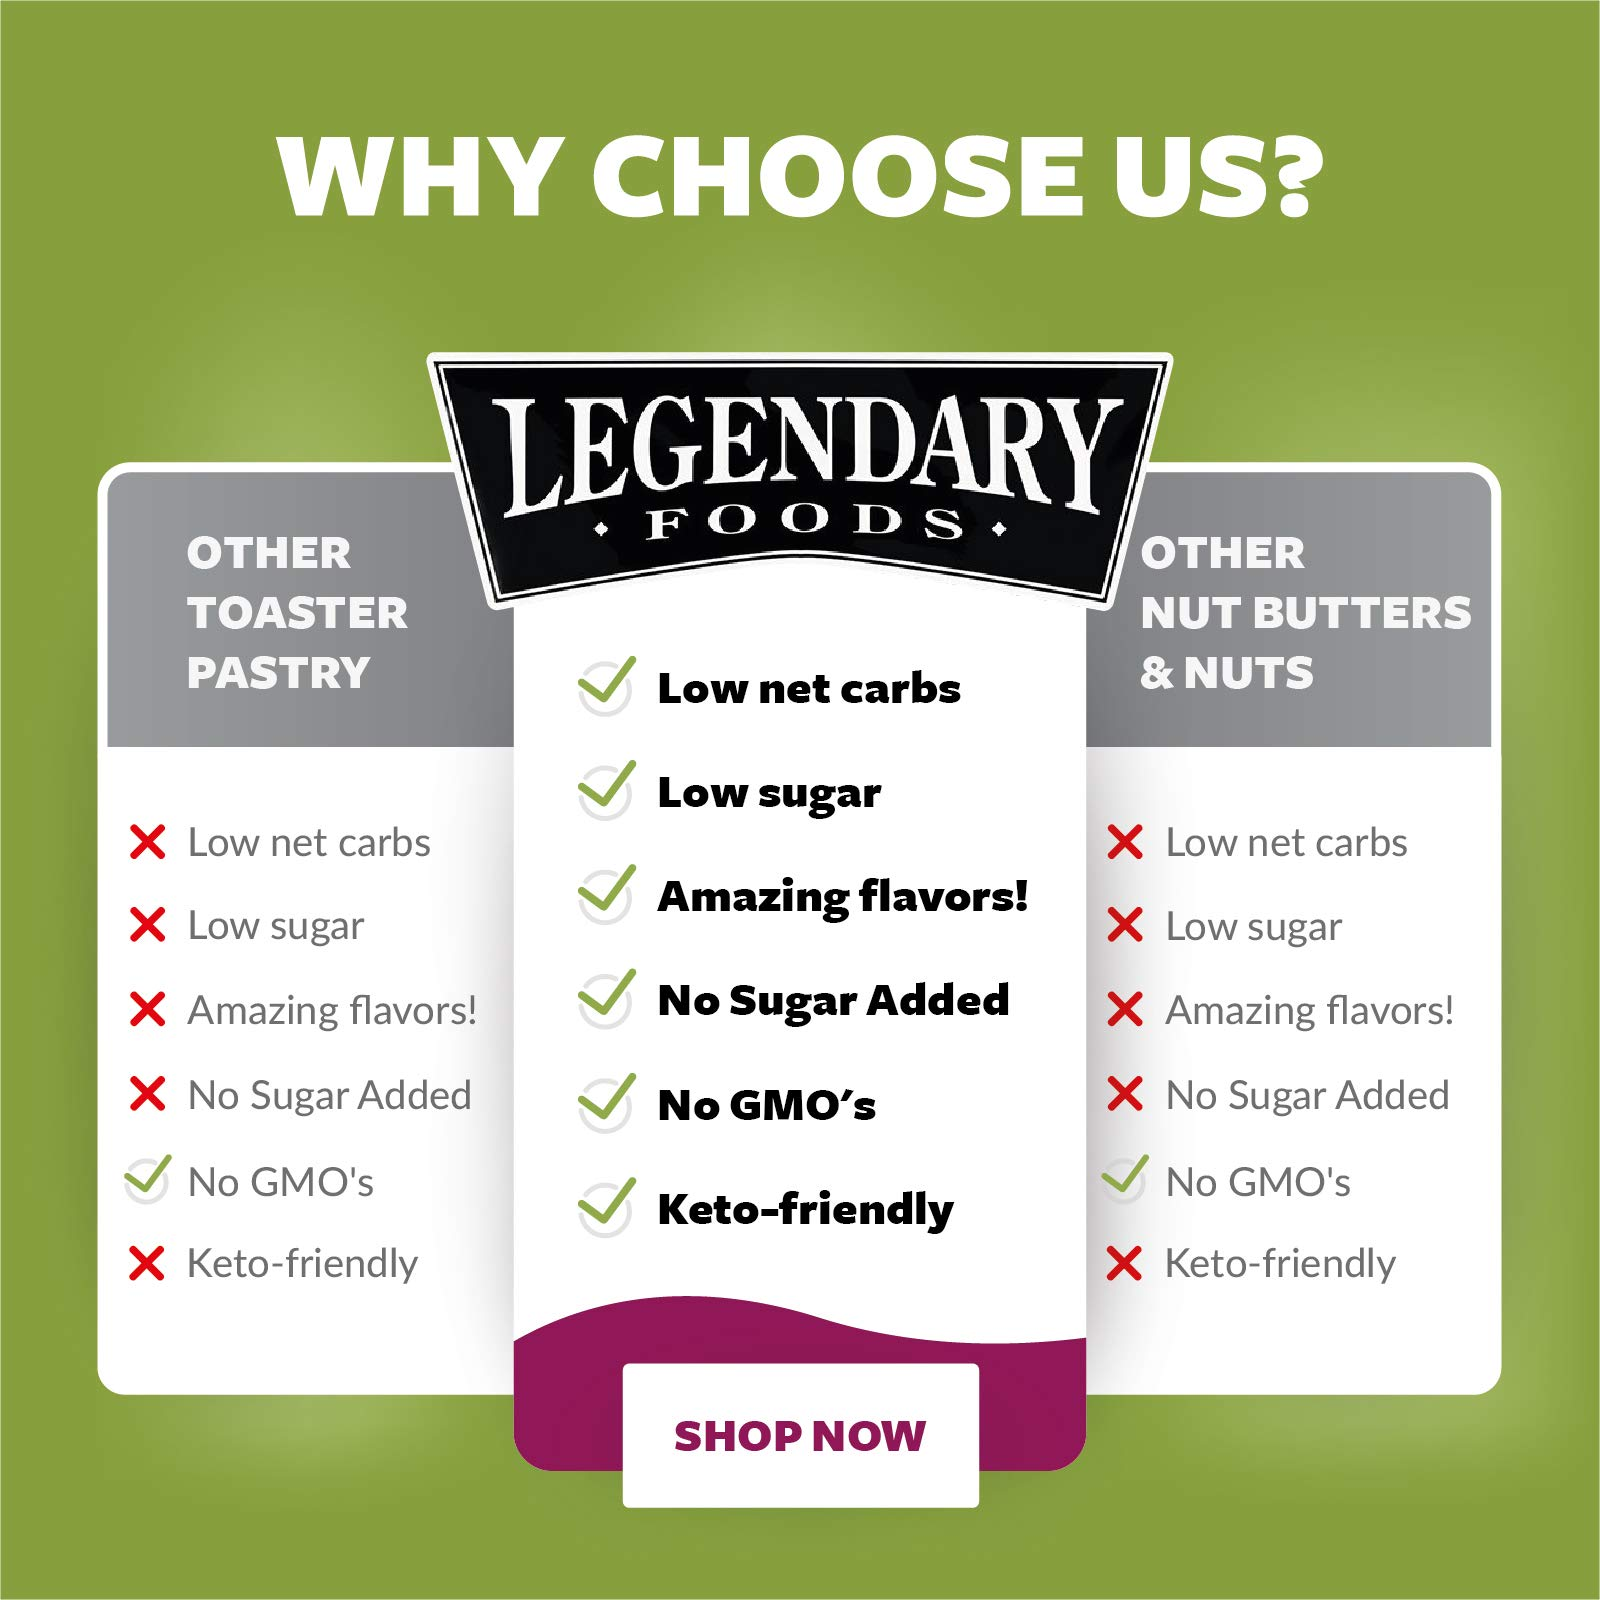 Legendary Foods Peanut Butter | Keto Diet Friendly, Low Carb, No Sugar Added, Vegan | Peanut Butter Cup (16oz Jar)